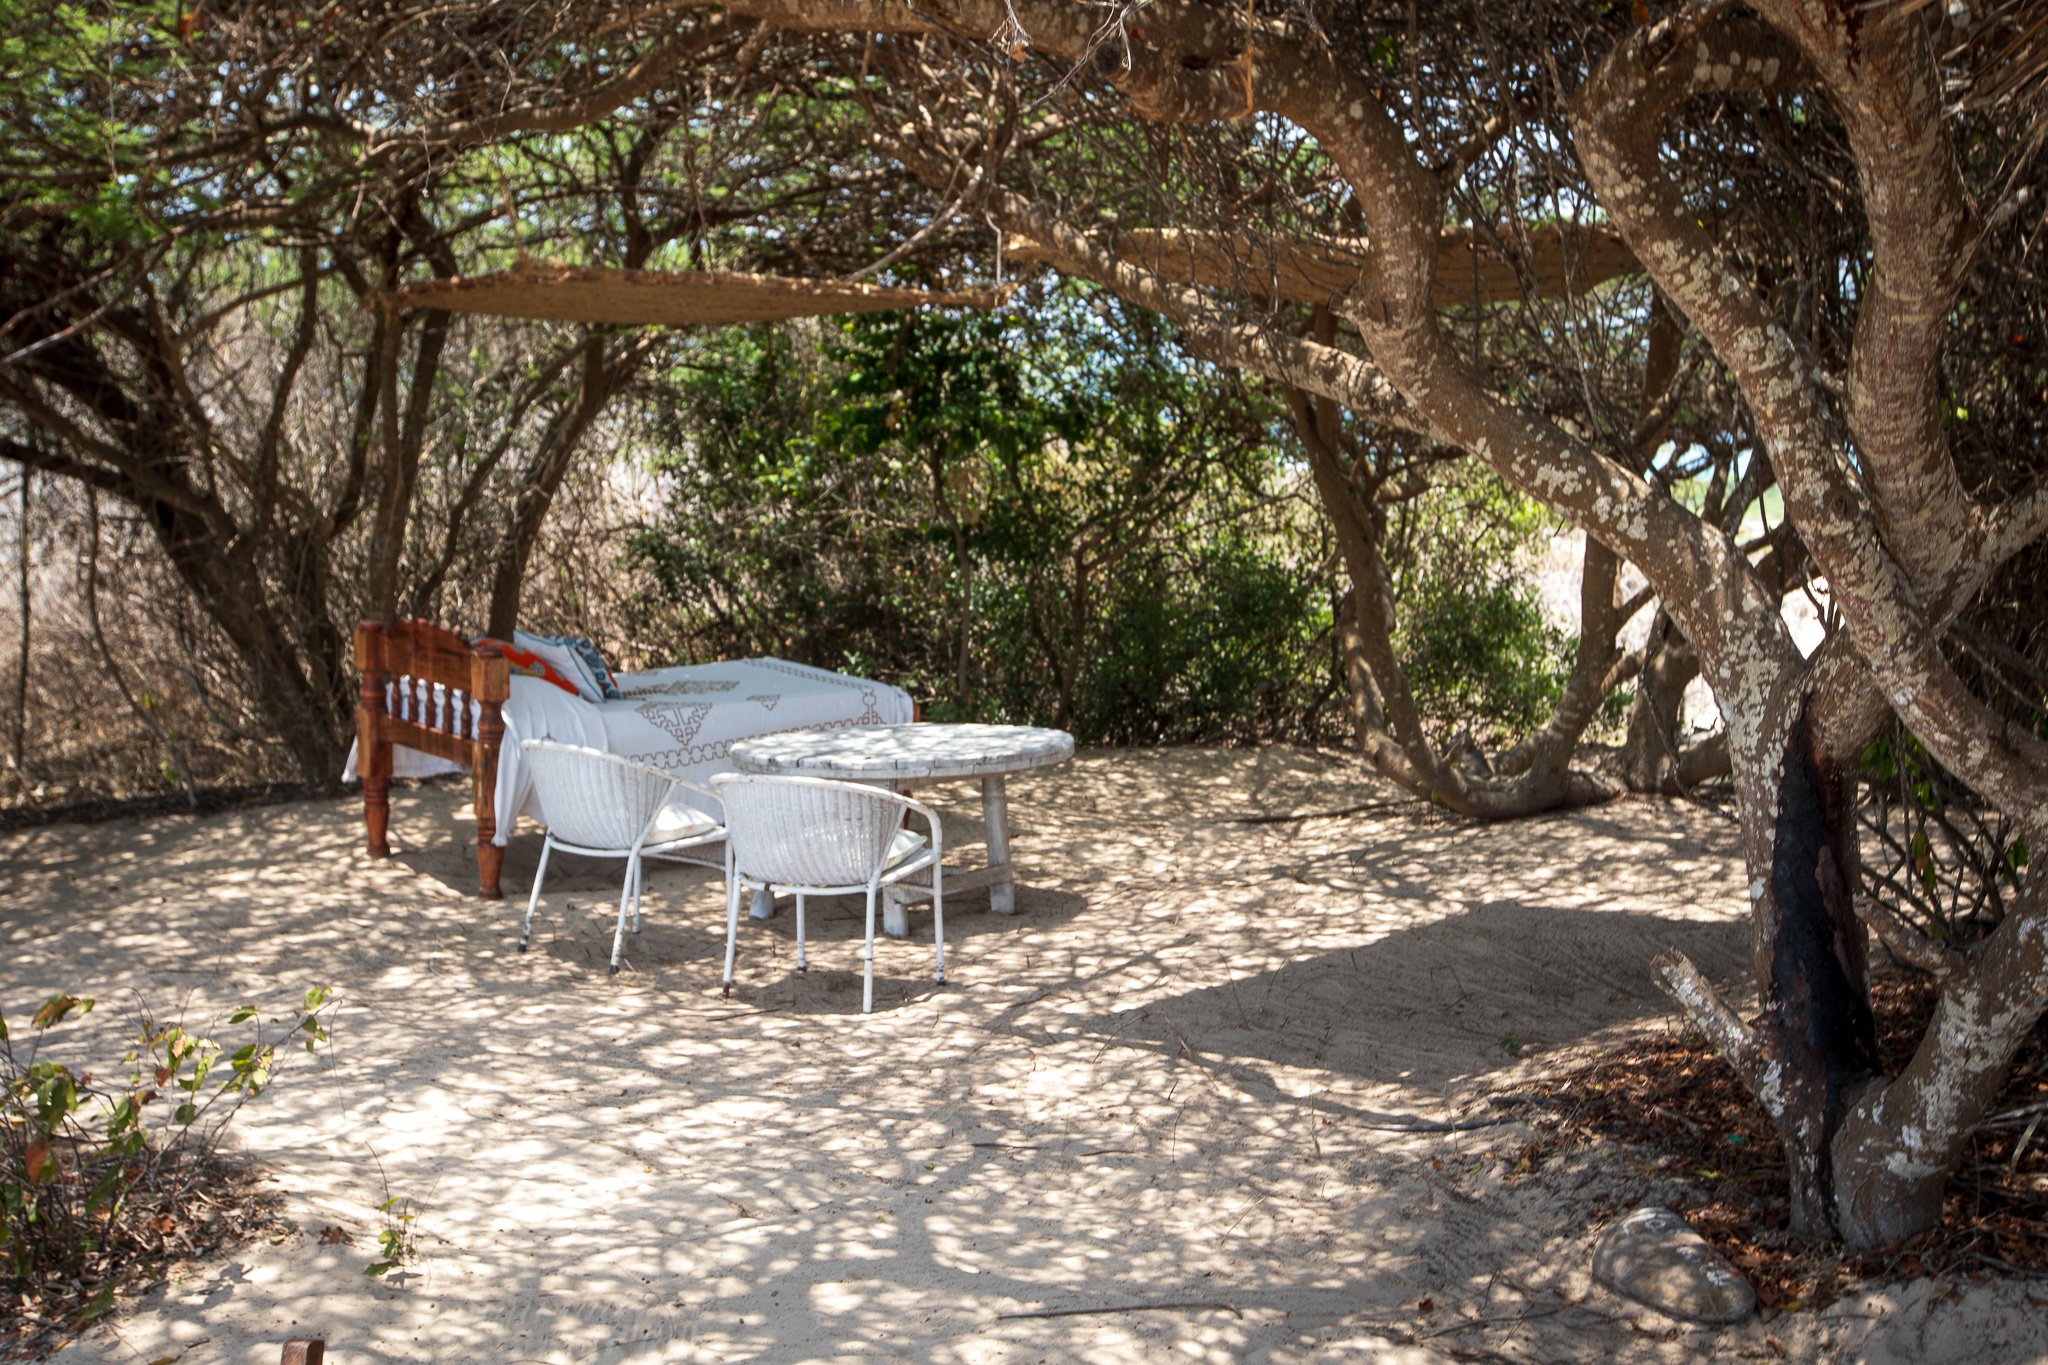 Sankuri under acacia